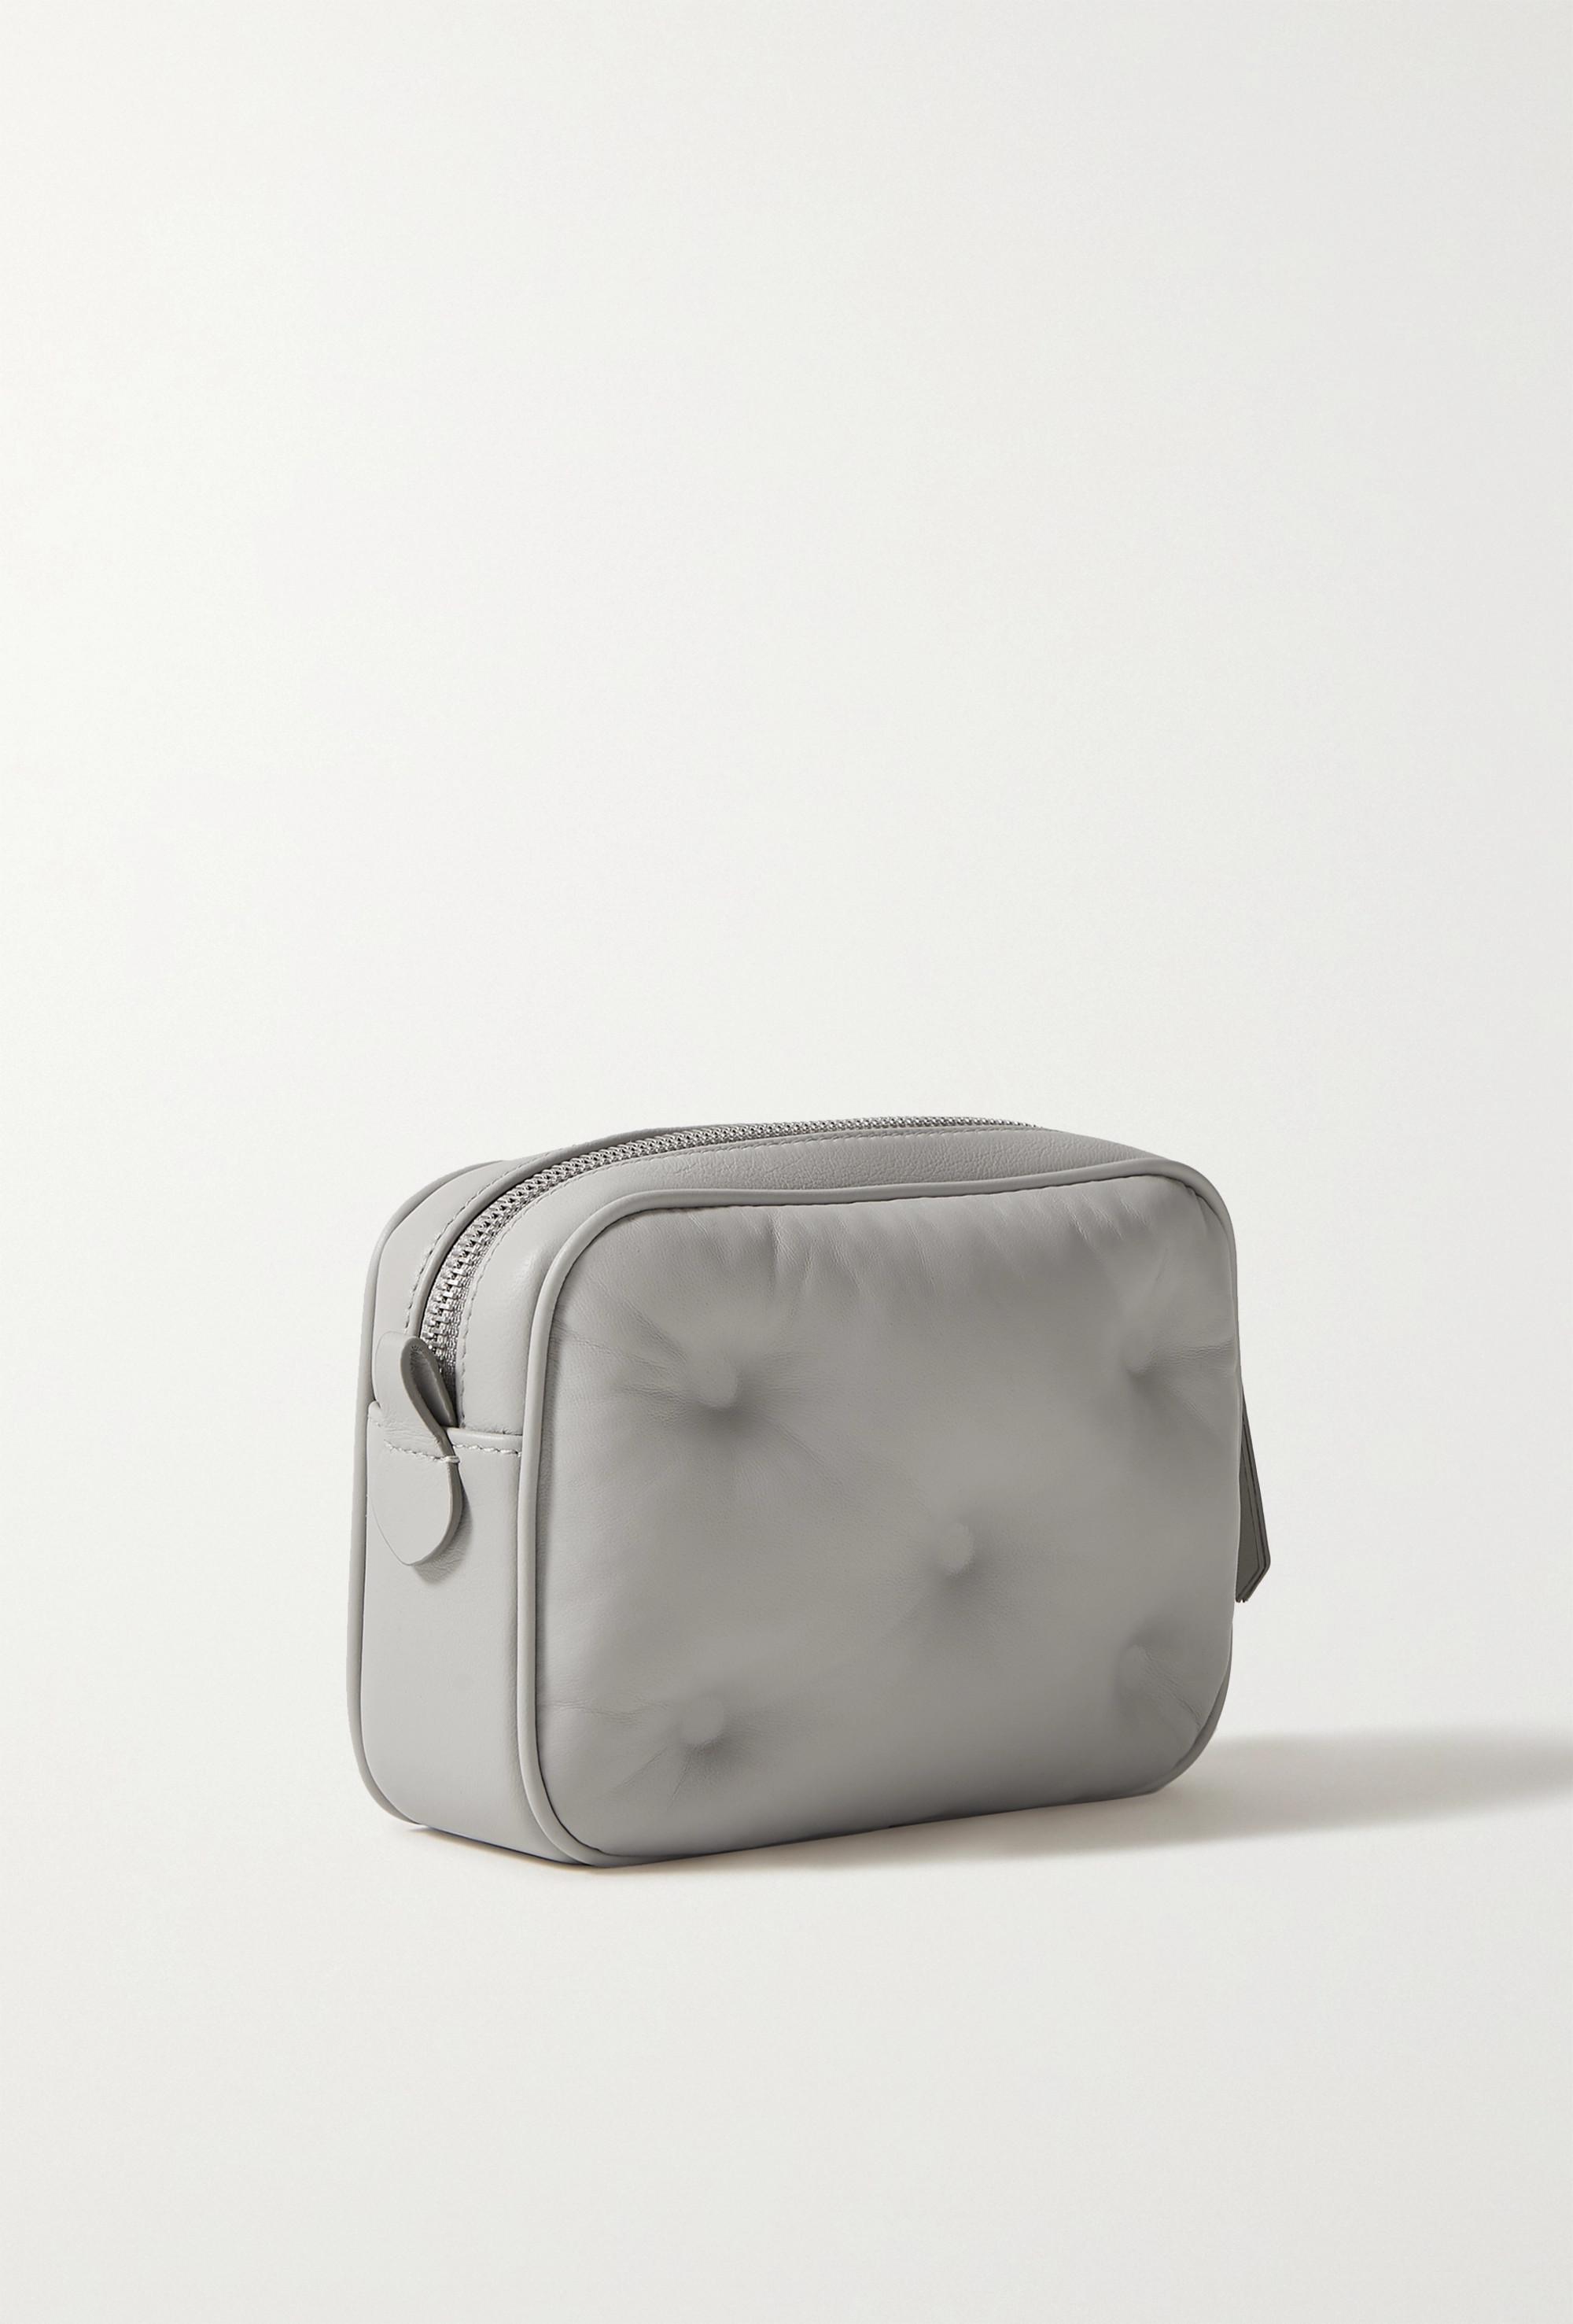 Maison Margiela Camera gesteppte Schultertasche aus Leder